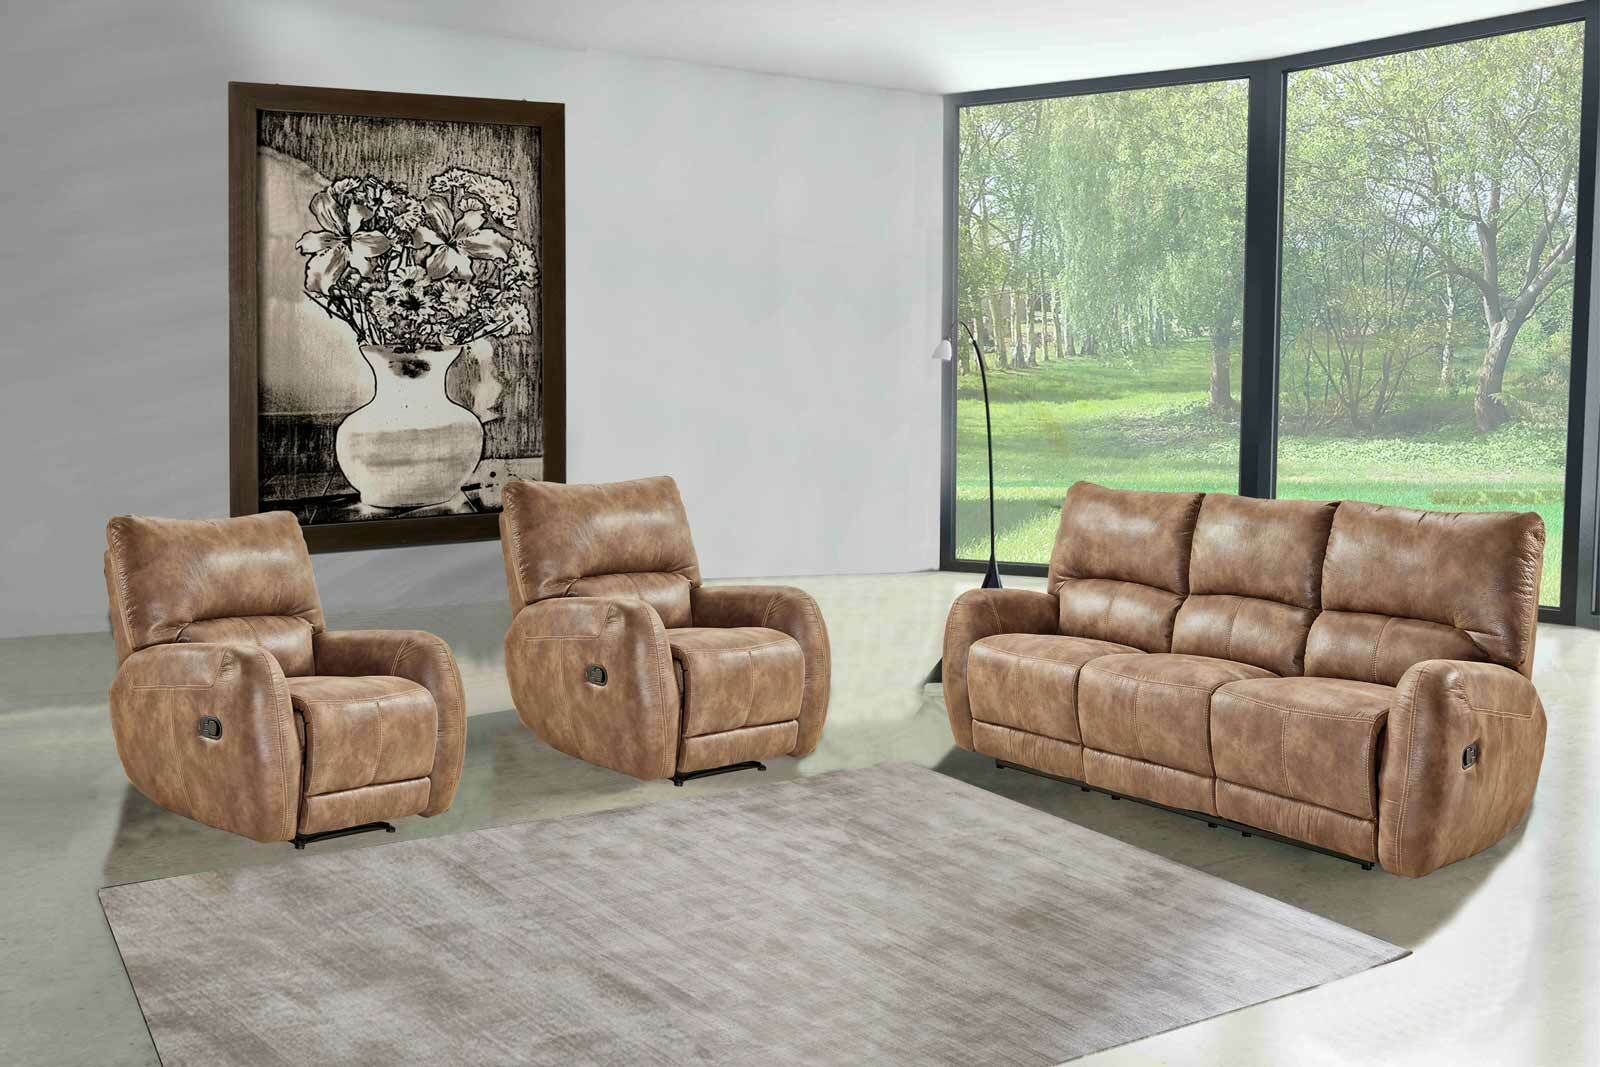 Full Size of Kinosessel 2er Microfaser Mehr Als 200 Angebote Sofa Grau Wohnzimmer Kinosessel 2er Microfaser